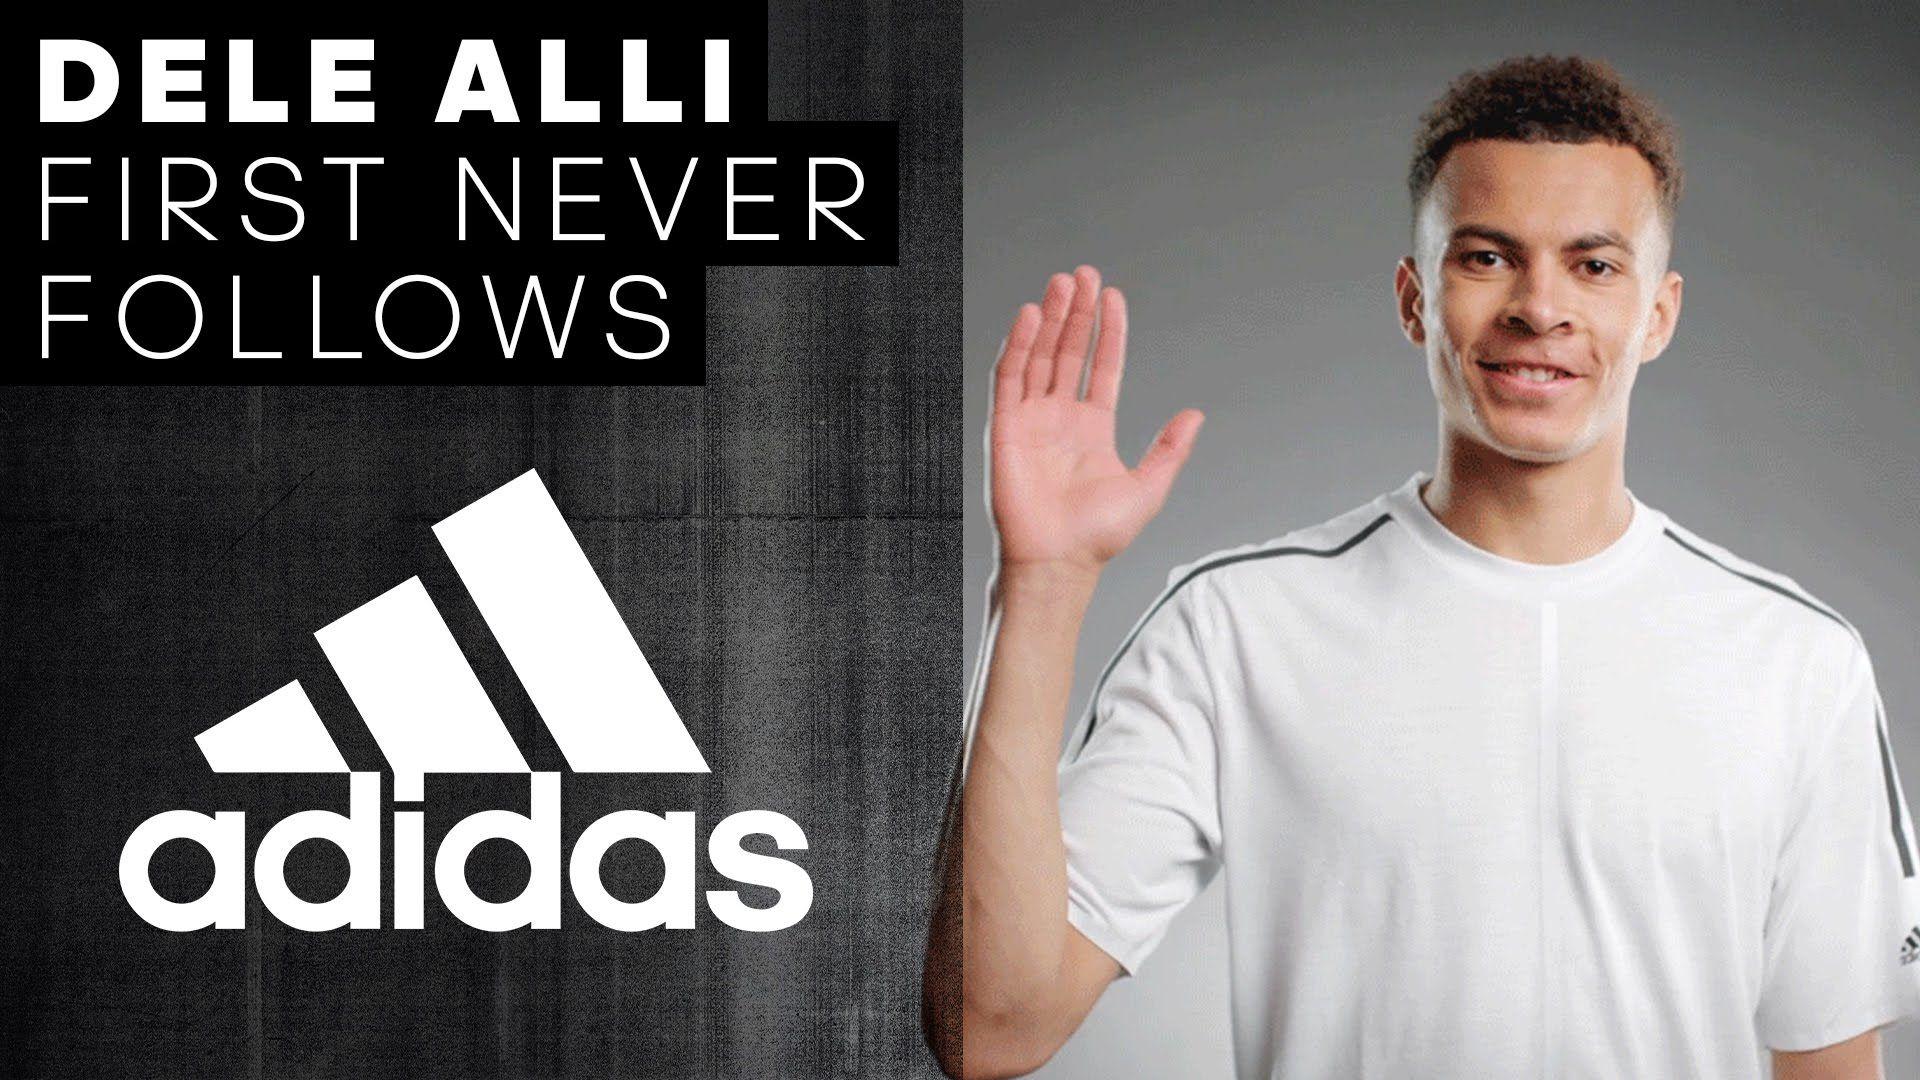 Fraude Prever símbolo  Dele Alli: First Never Follows -- adidas Football • /r/soccer   Adidas  football, Dele alli, Midfielder